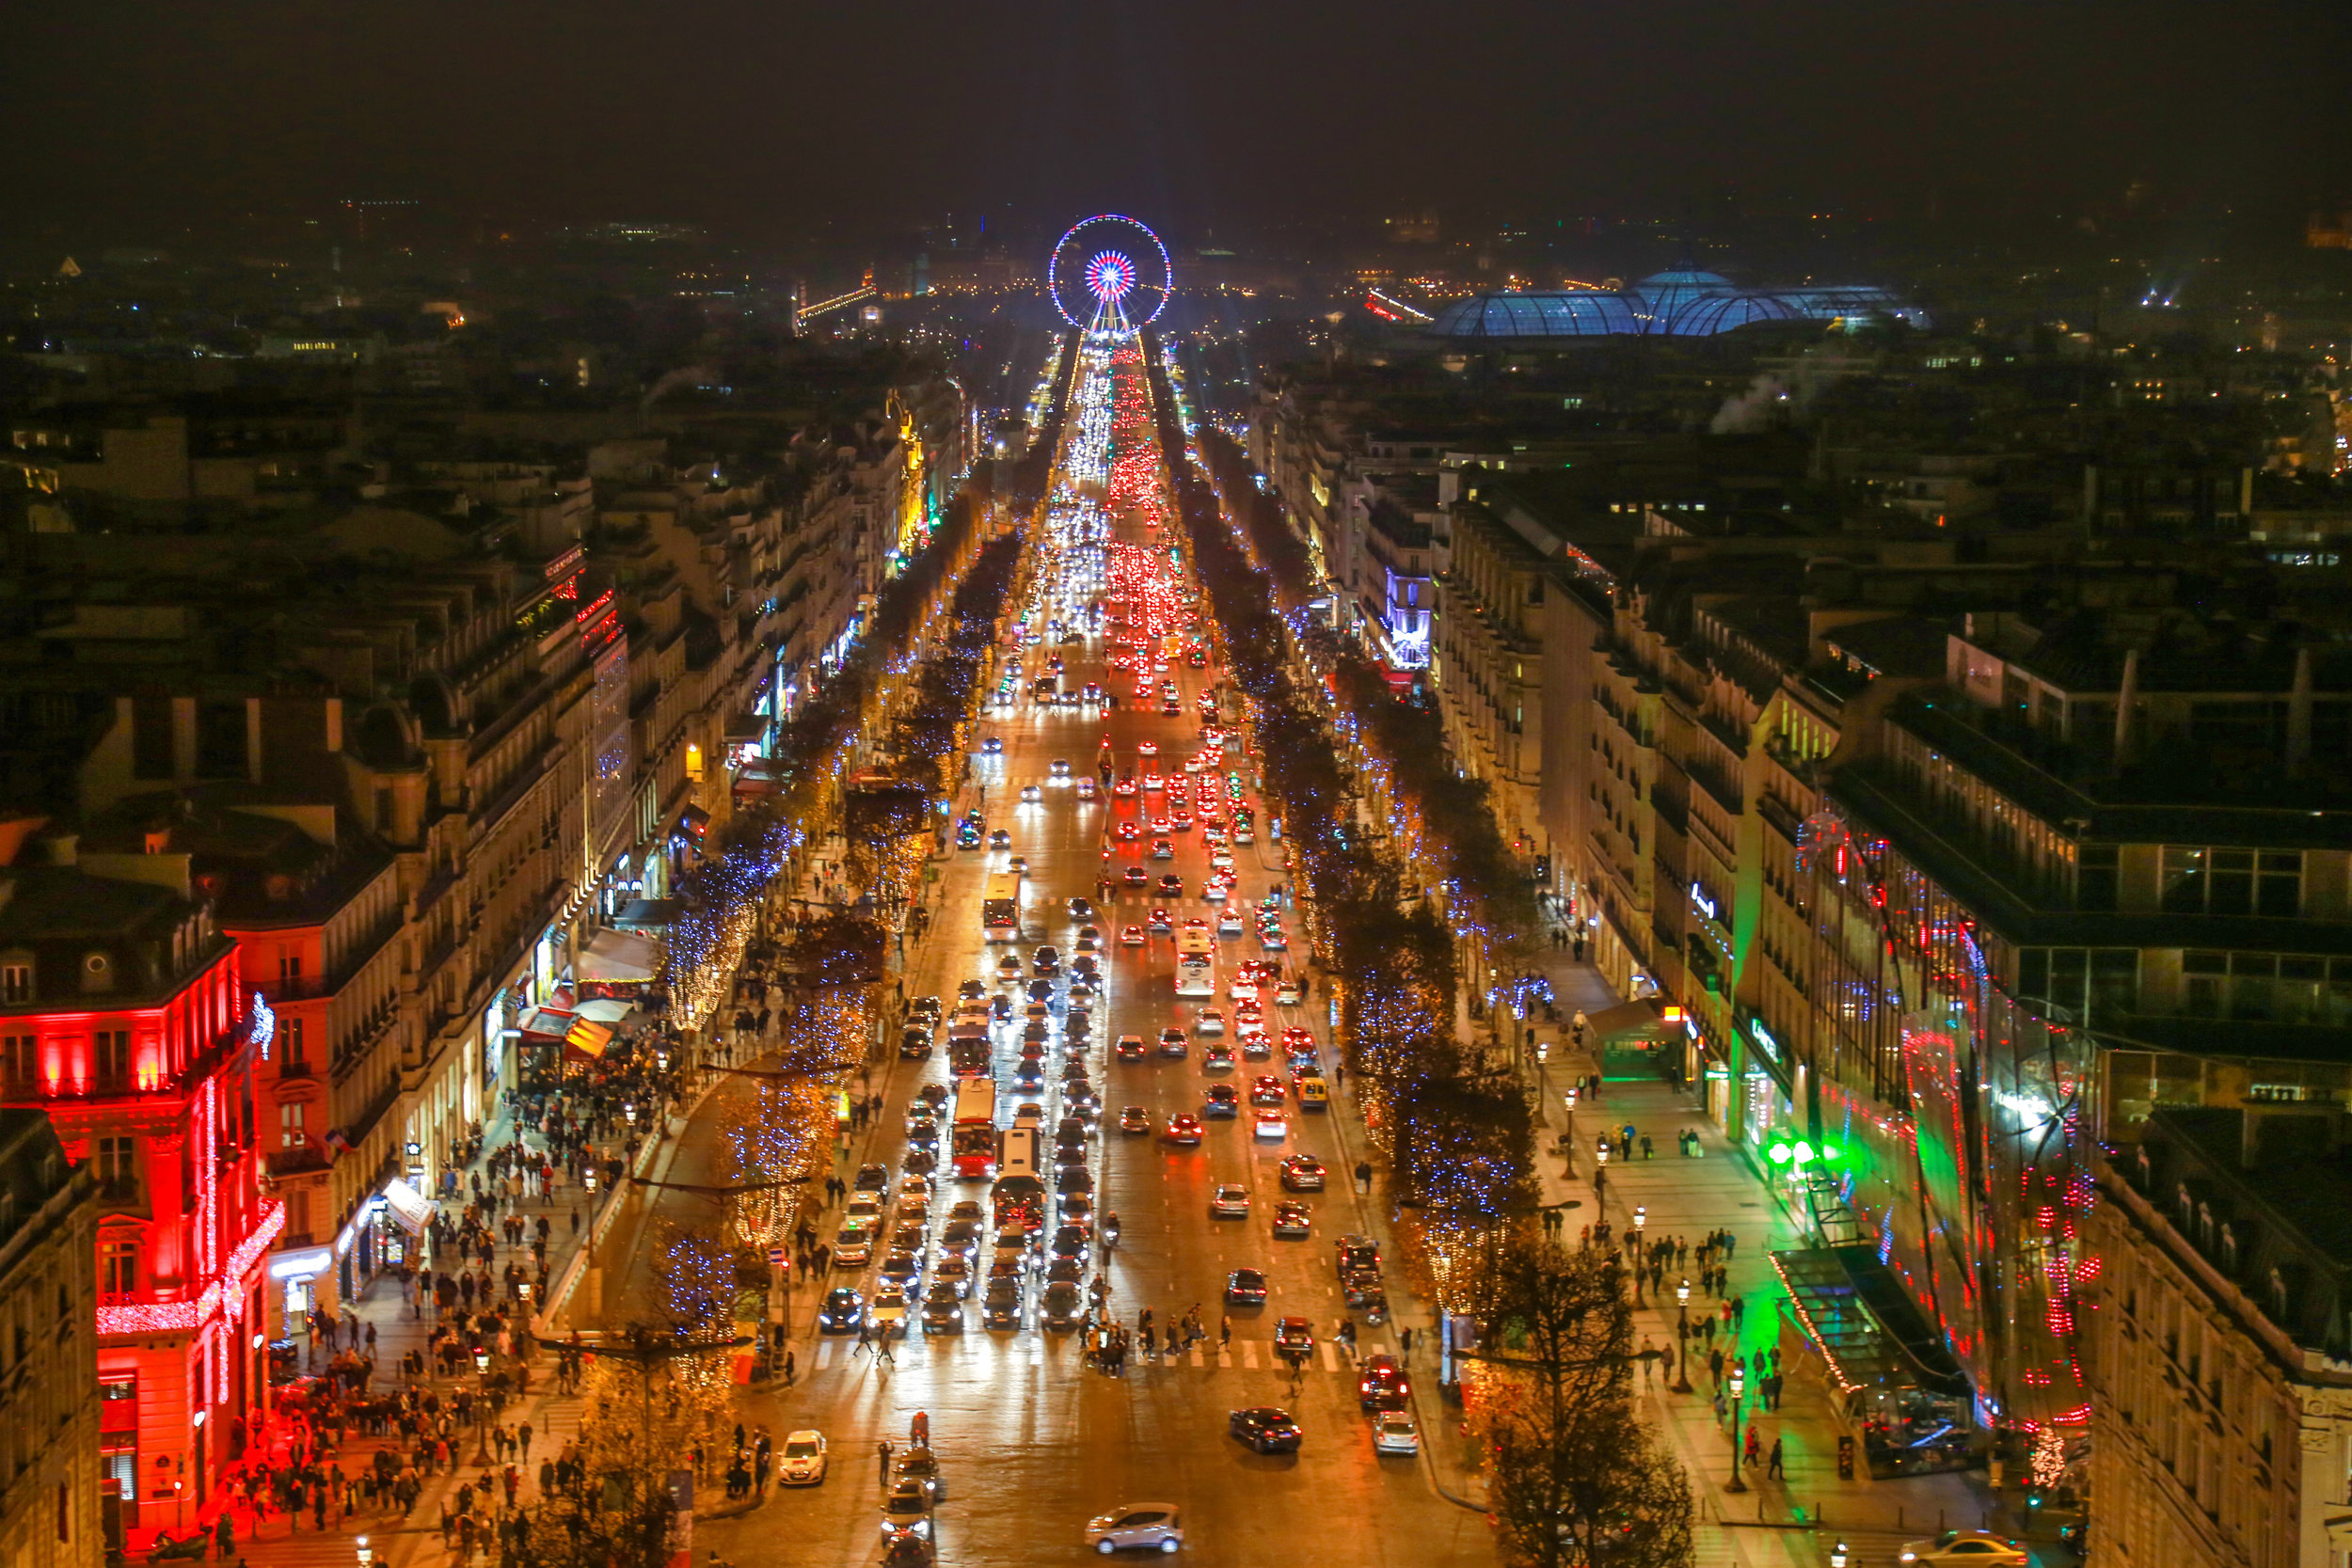 Champs_Elysees.jpg